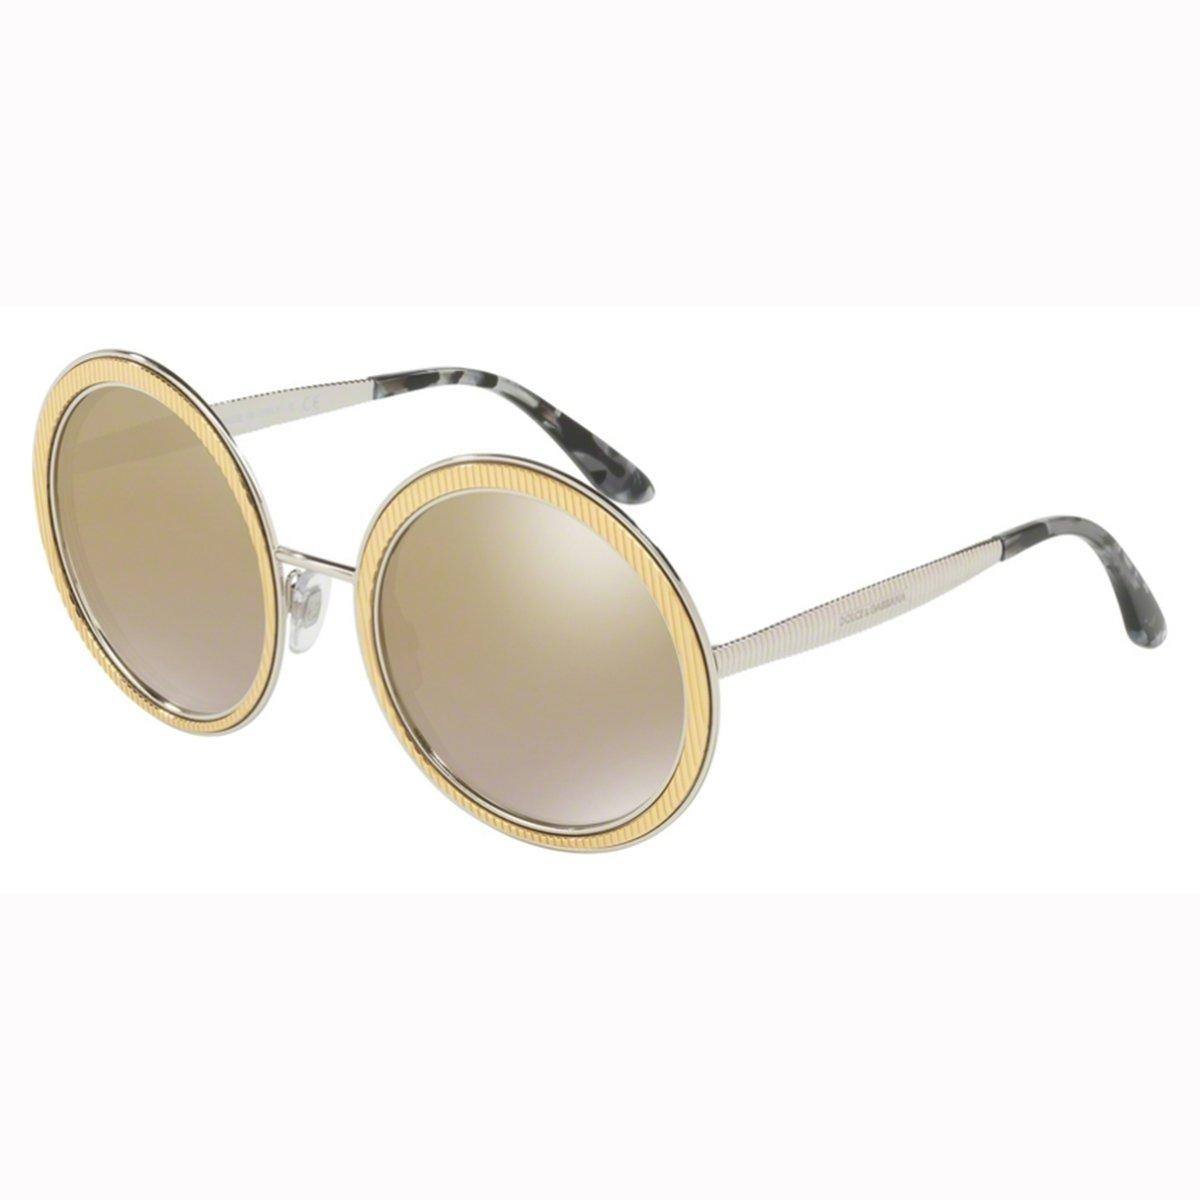 4440c96ac Compre Óculos de Sol Dolce & Gabbana em 10X | Tri-Jóia Shop